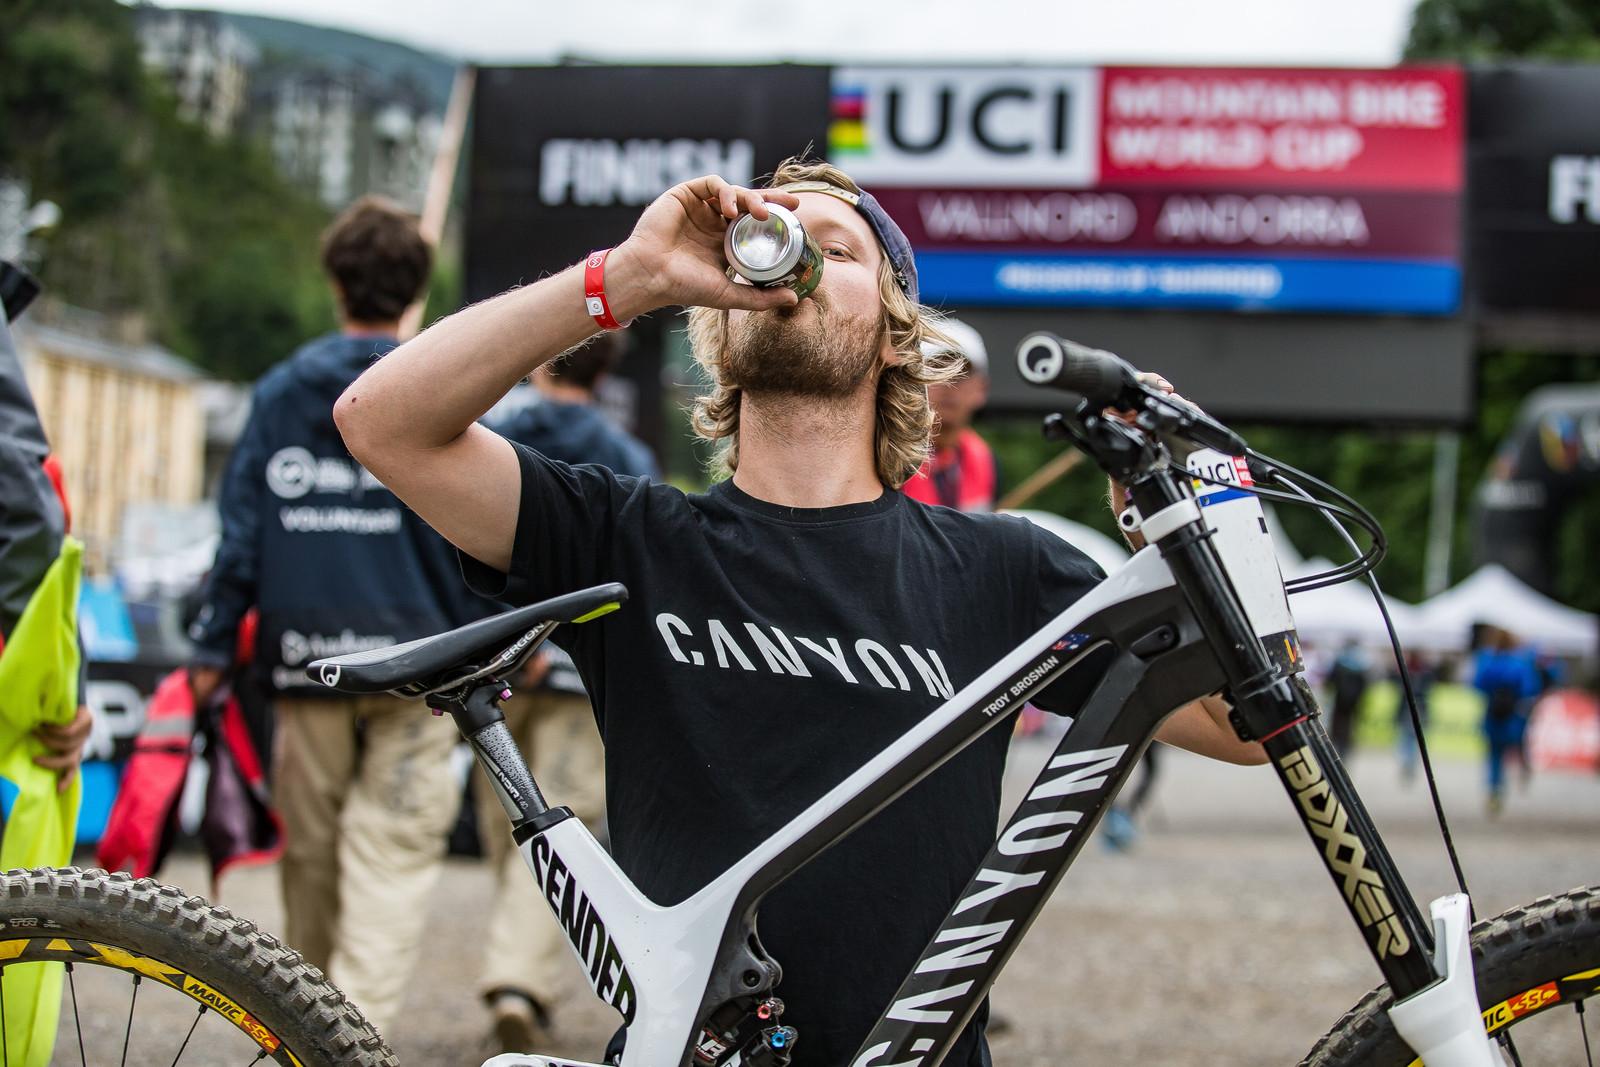 Troy's Mechanic, Aaron Pelttari - WINNING BIKE: Troy Brosnan's Canyon Sender - Mountain Biking Pictures - Vital MTB